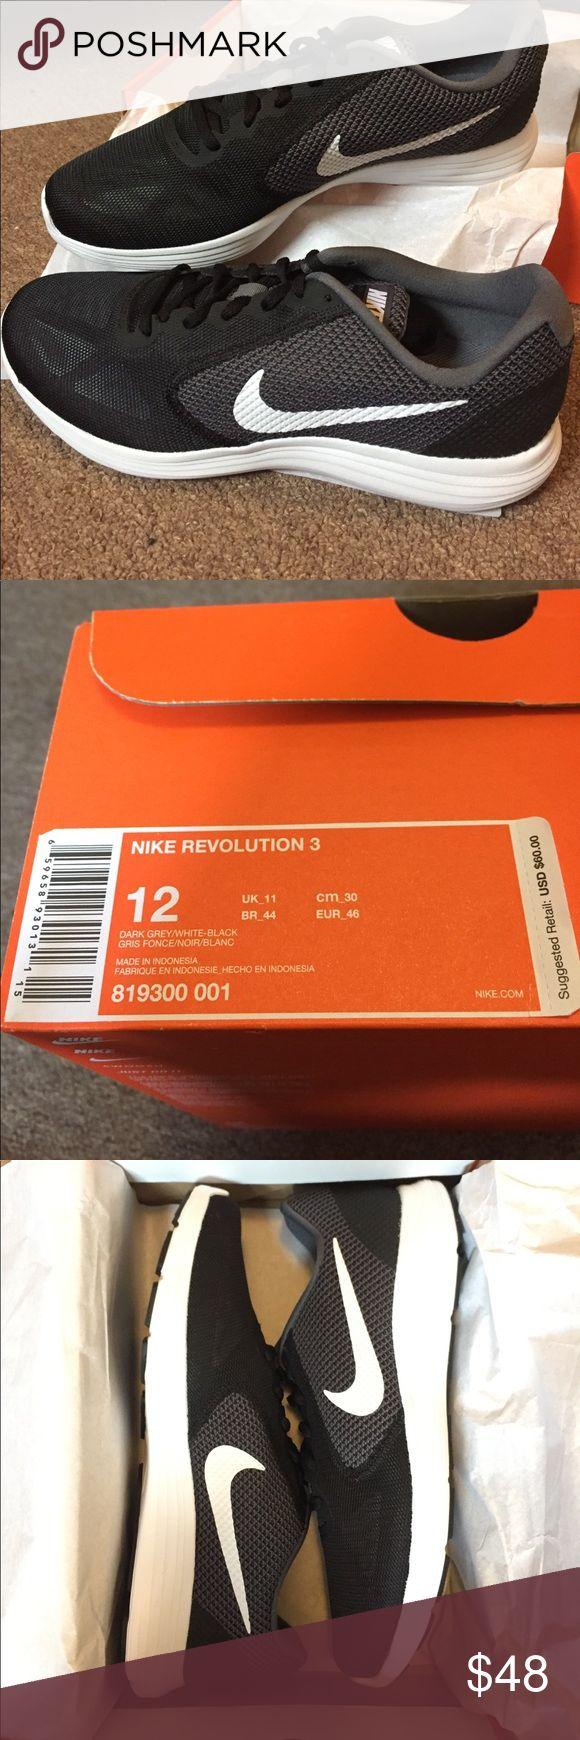 Nike Revolution 3 Sneakers Brand new Nike Revolution 3 Sneakers dark grey/white-black Nike Shoes Sneakers